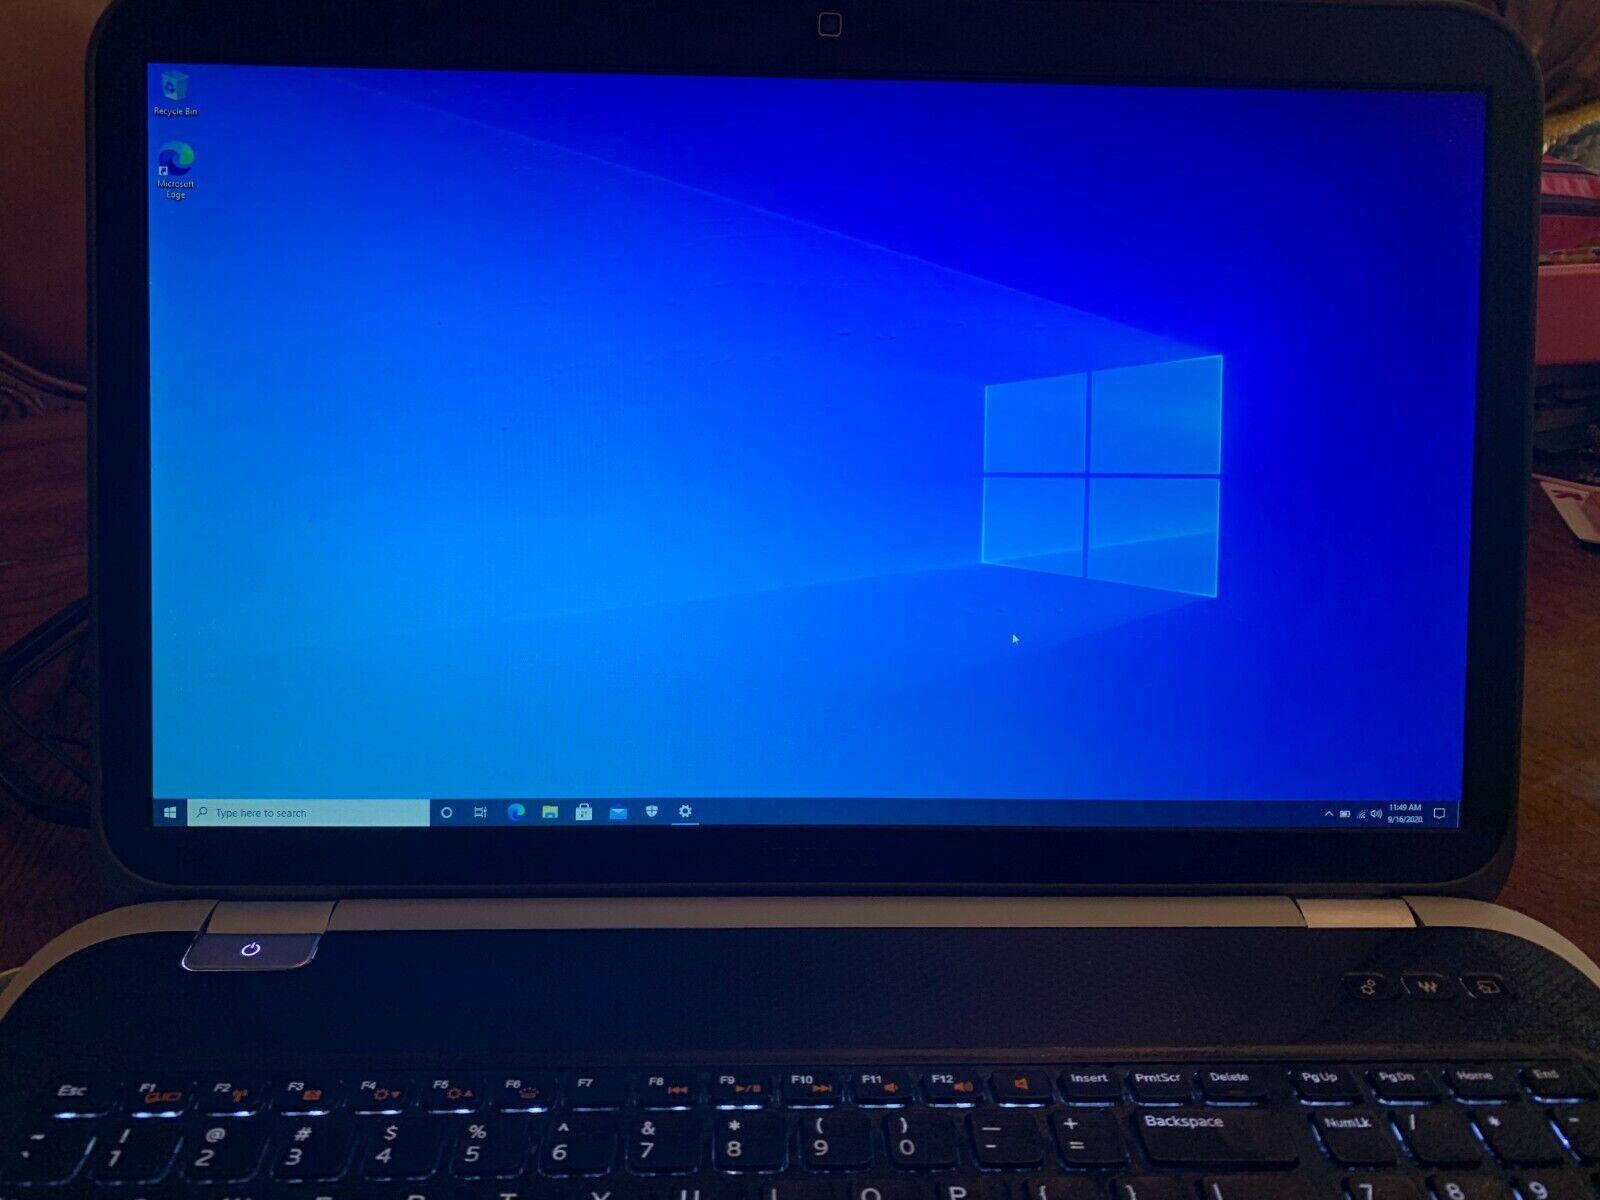 Laptop Windows - Dell Inspiron 17R 7720! Core i7! 8GB RAM! 1TB HD!! Windows 10 Home!!